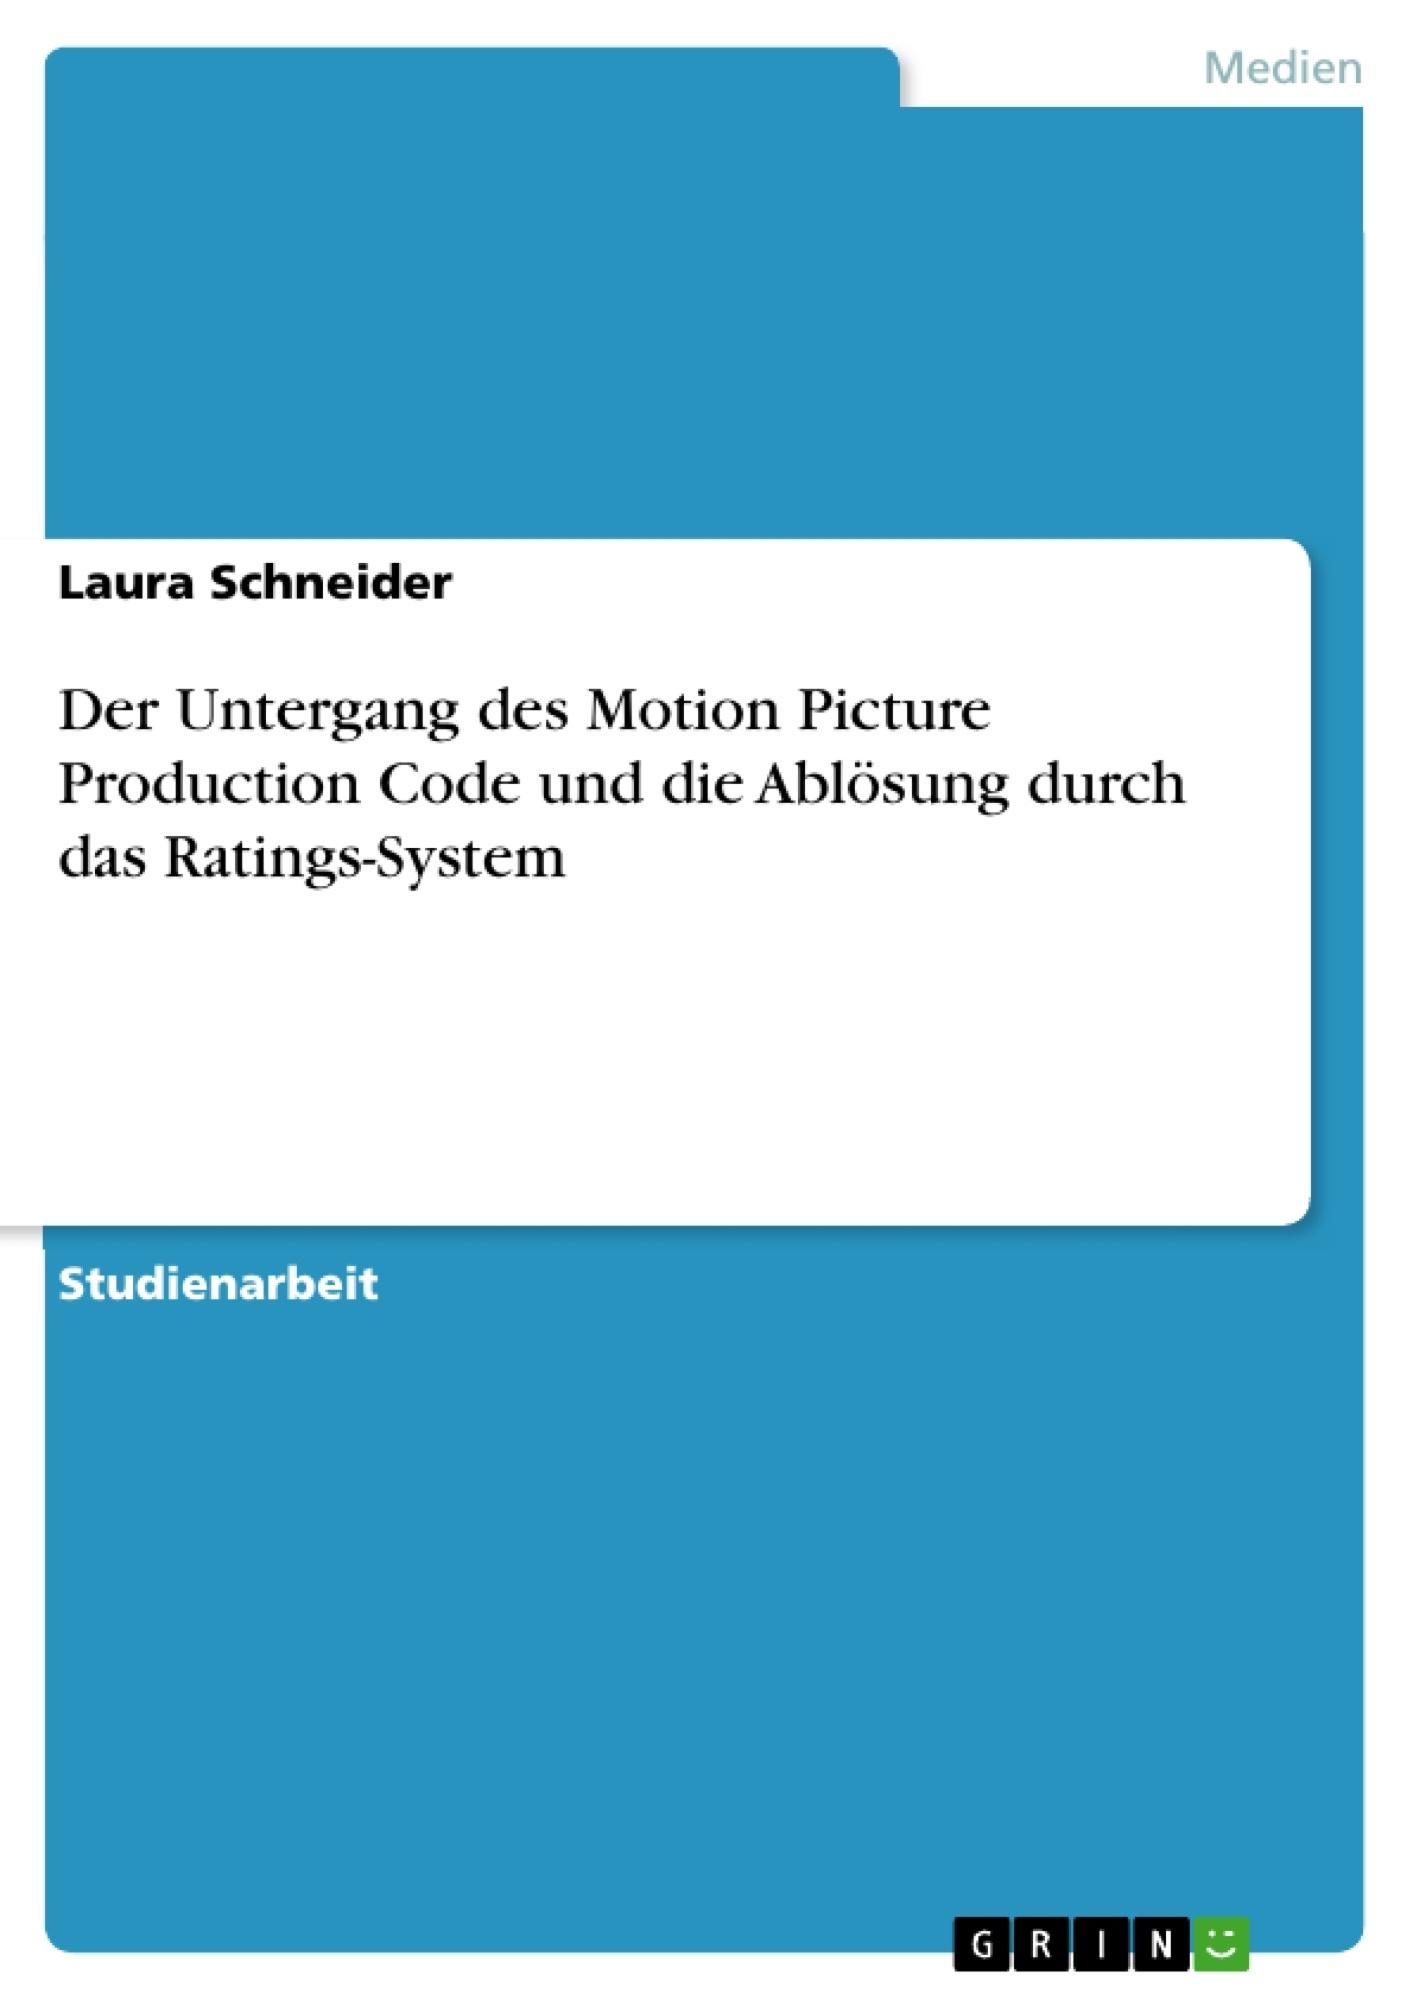 Titel: Der Untergang des Motion Picture Production Code und die Ablösung durch das Ratings-System